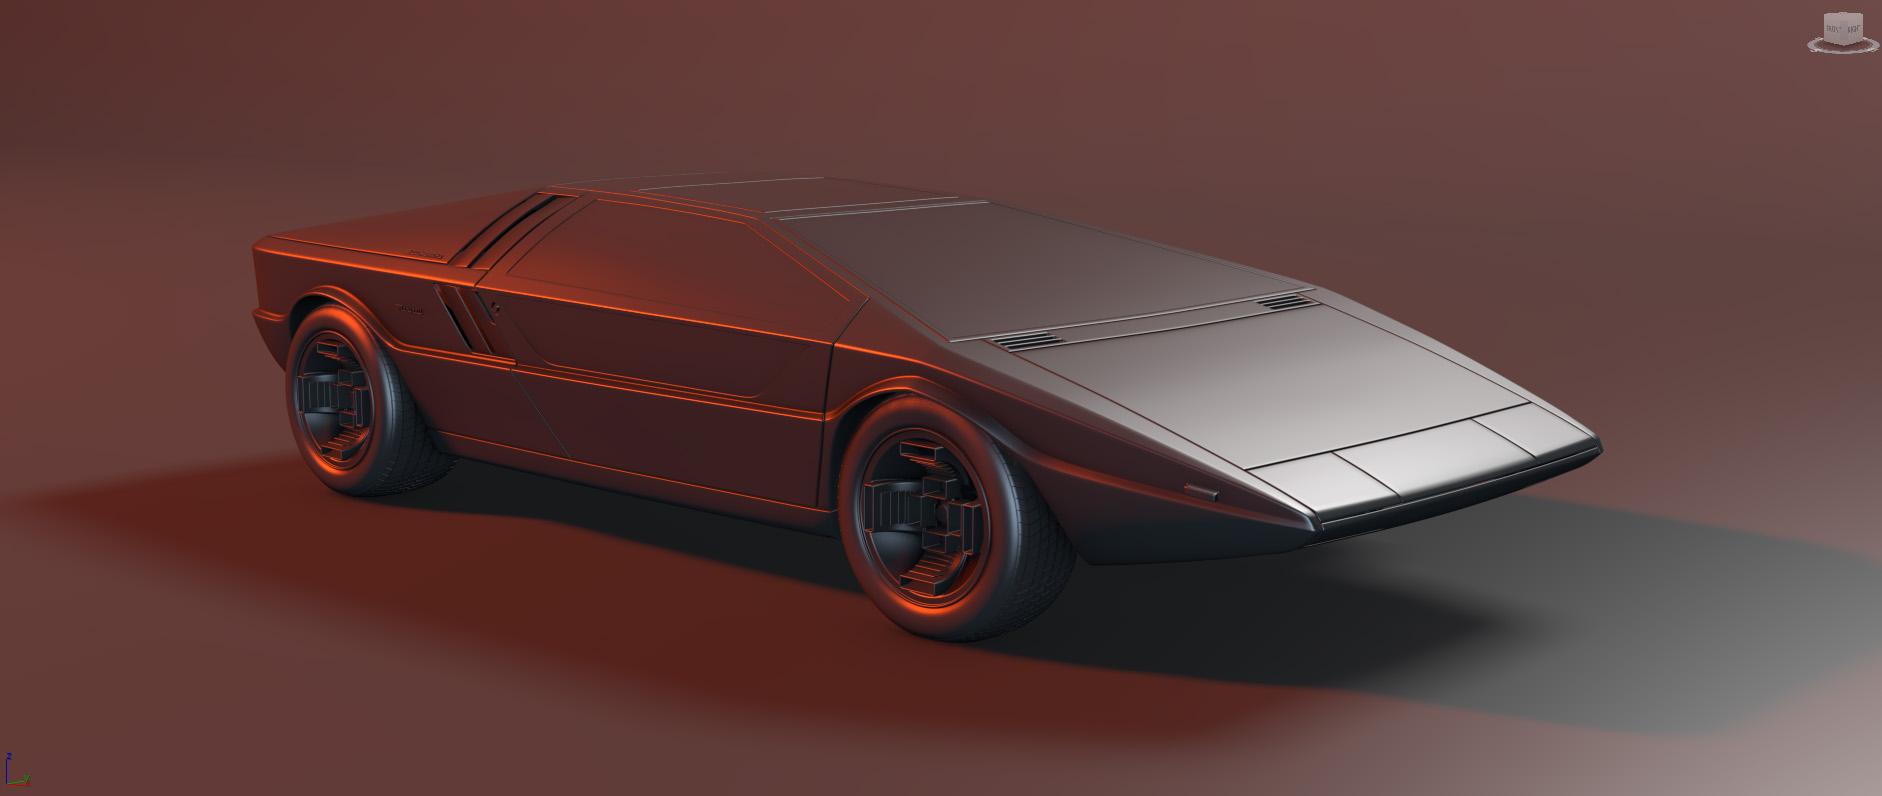 2018 Car Render Challenge - Maserati Boomerang